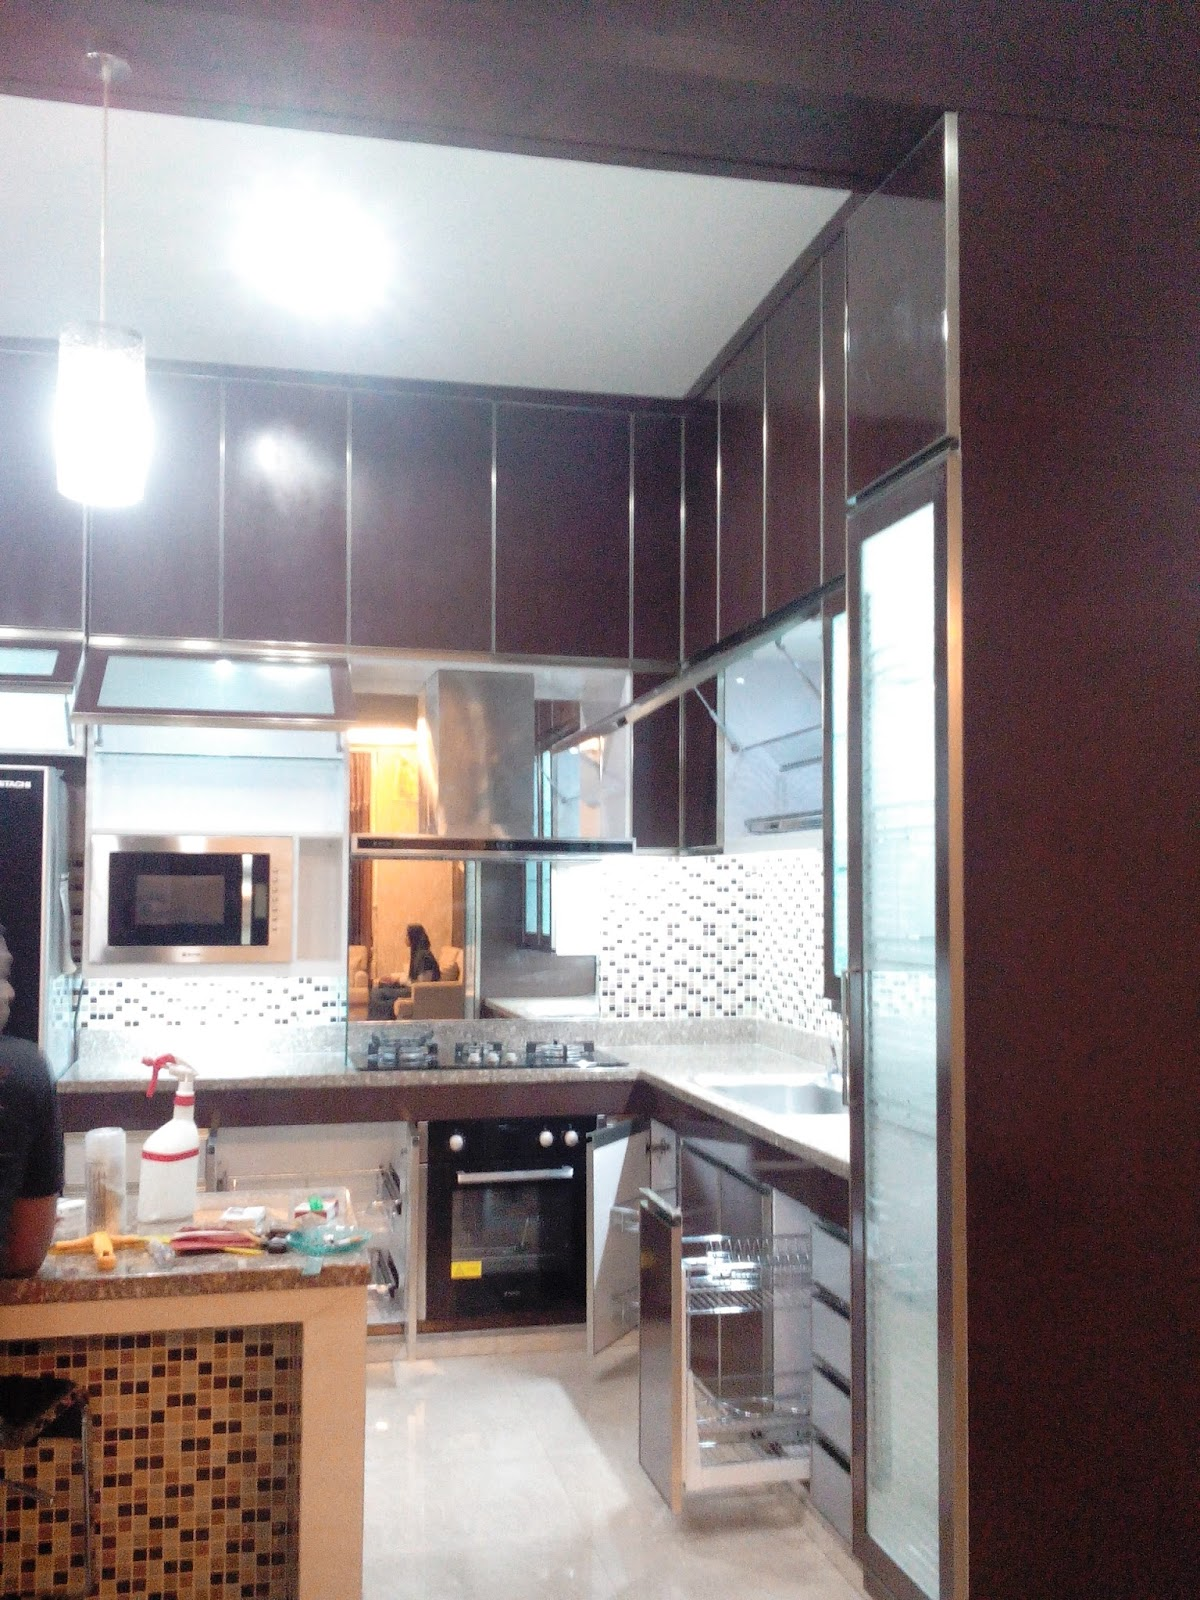 Desain interior desain mebel desain produk kontruksi dan for Kitchen set kompor tanam